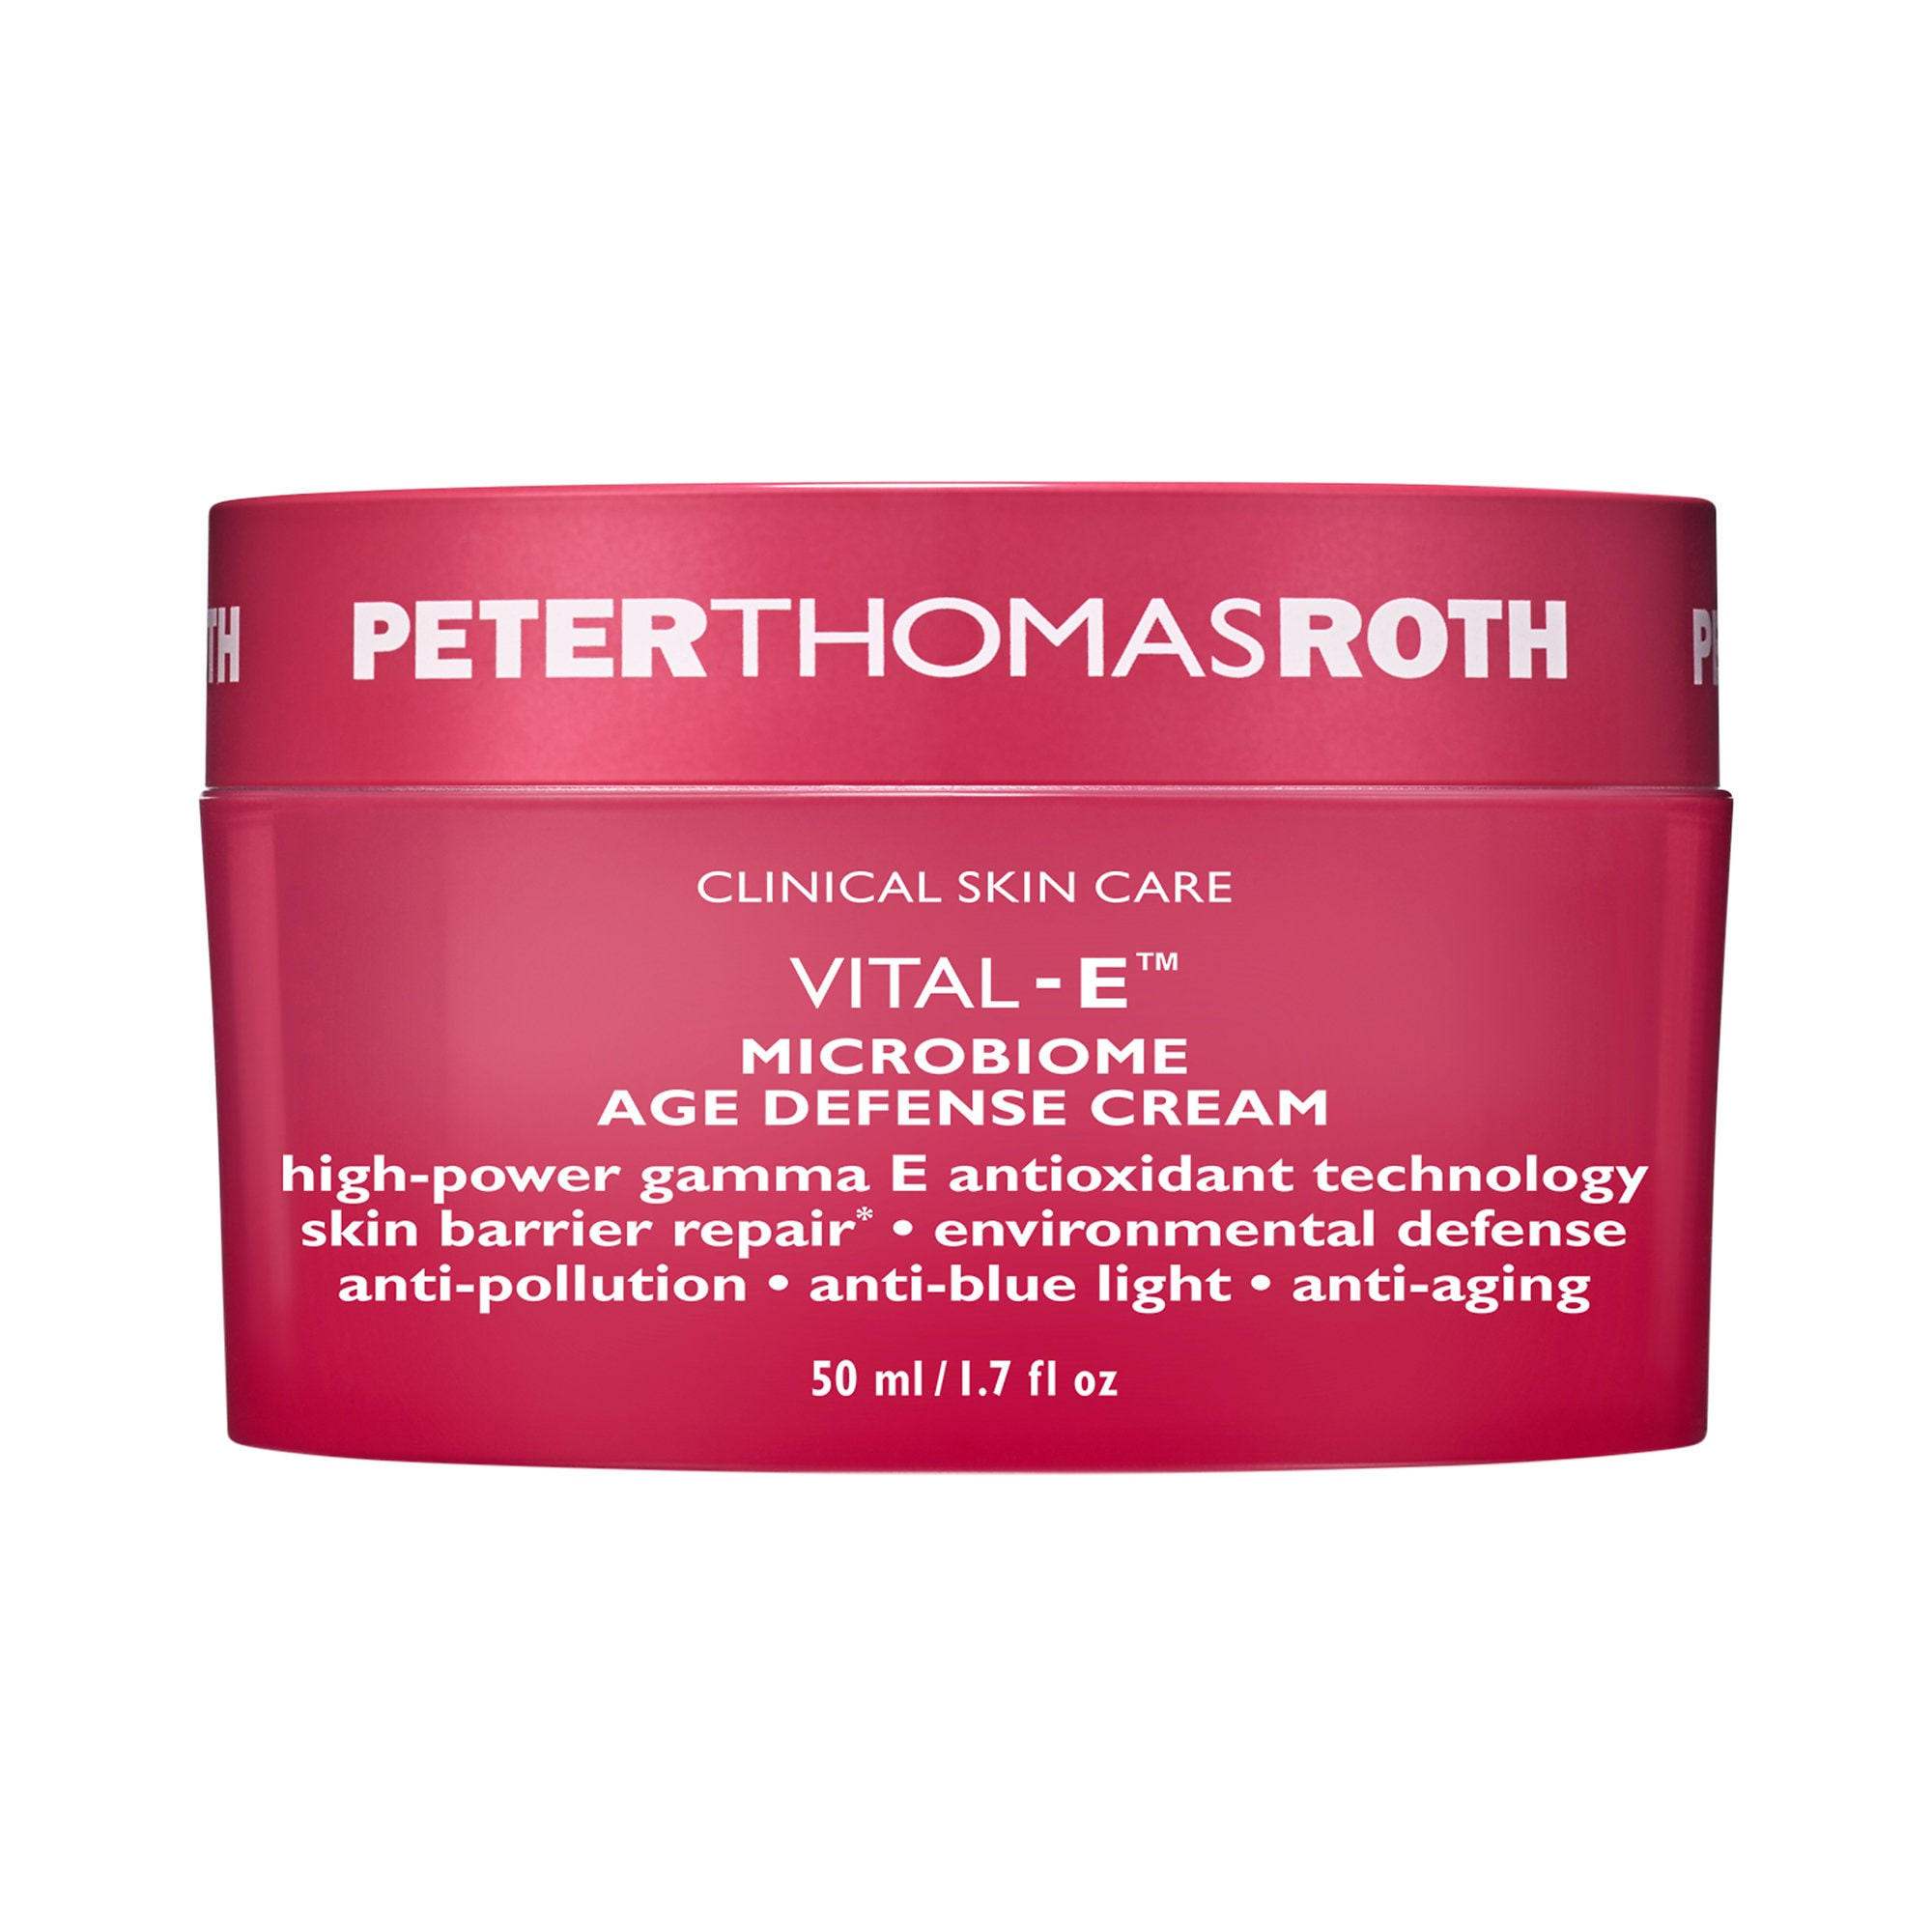 Peter Thomas Roth - Vital-E™ Microbiome Age Defense Cream